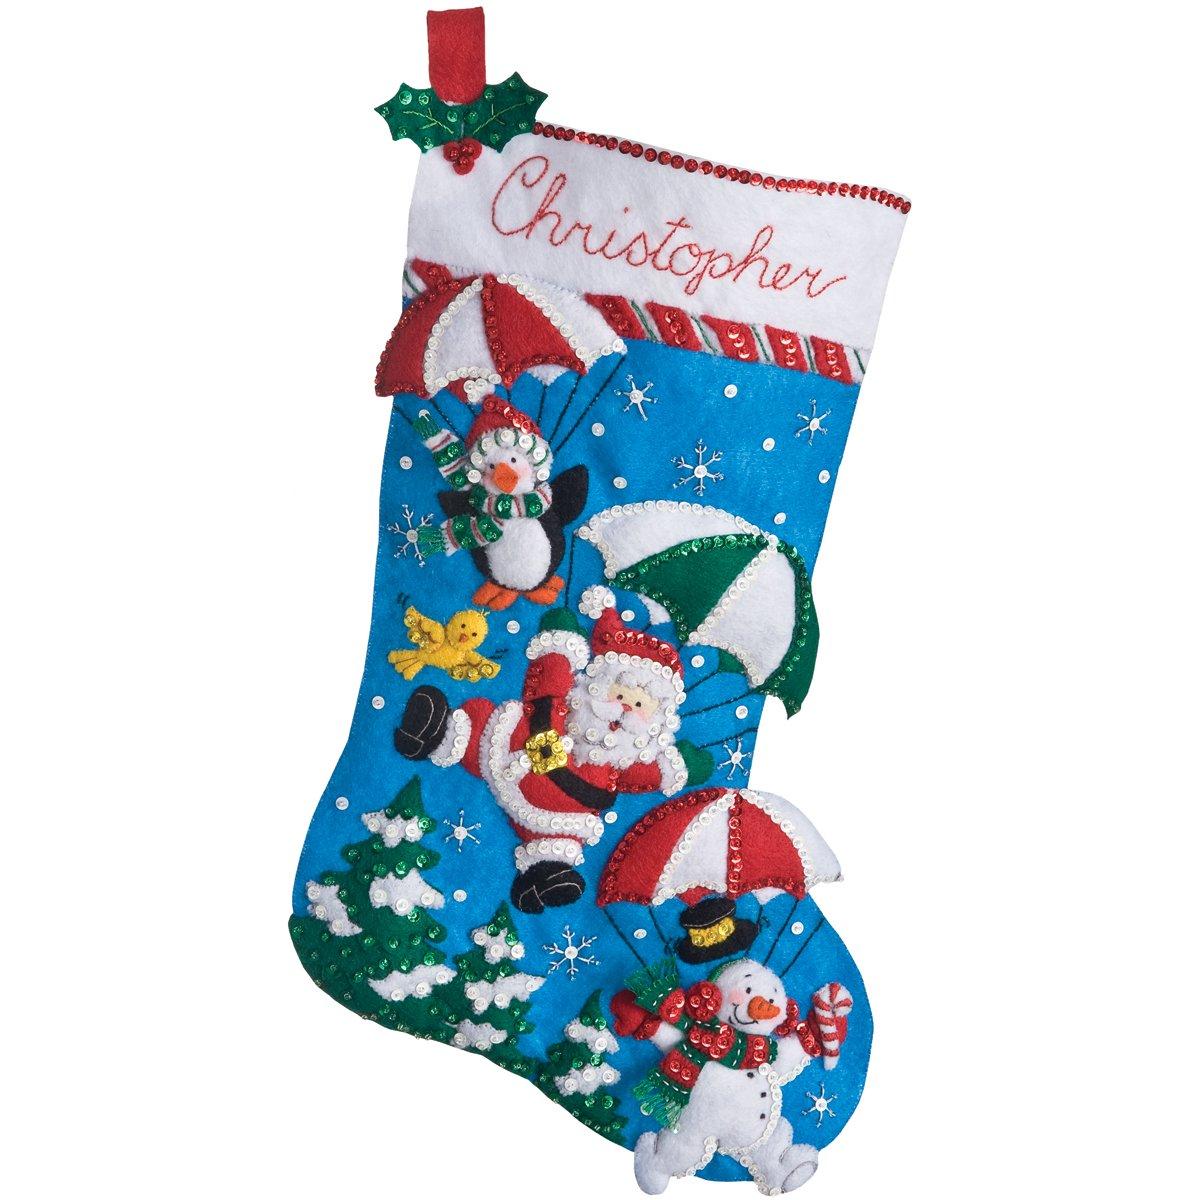 Bucilla 18-Inch Christmas Stocking Felt Applique Kit, 86325 Dropping In Plaid Inc